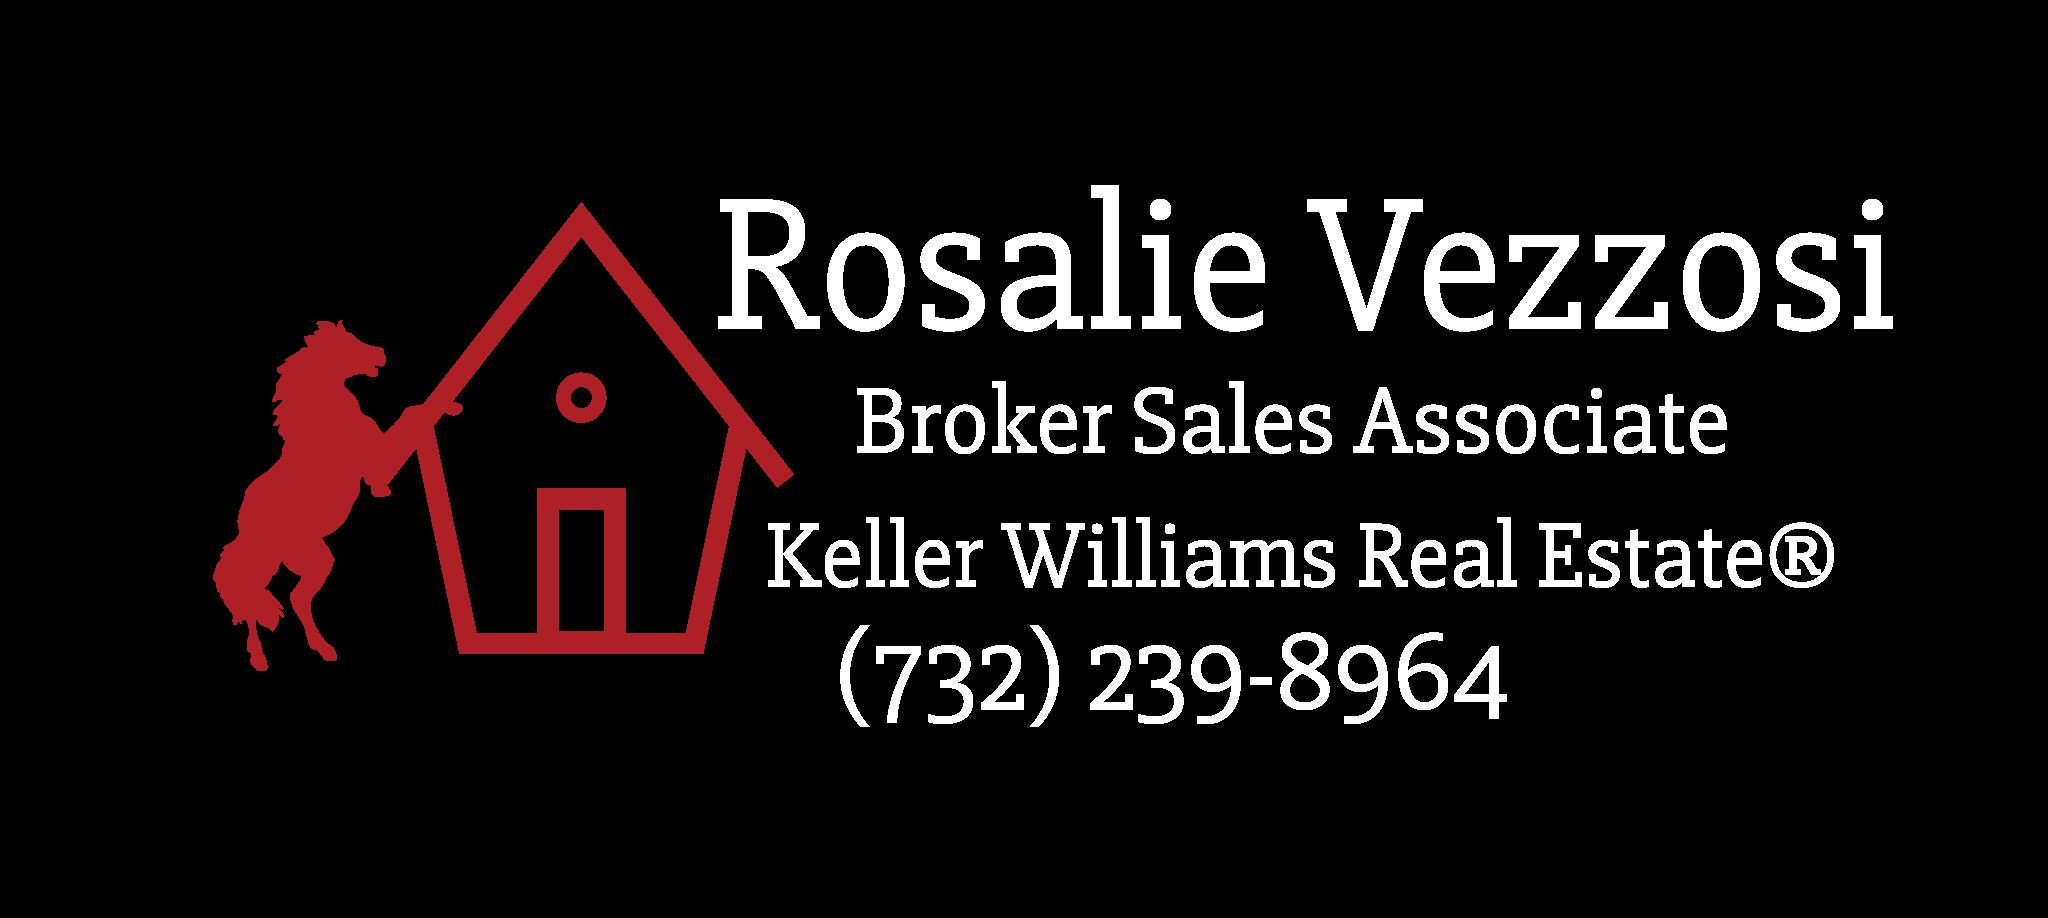 Homes by Rosalie Vezzosi